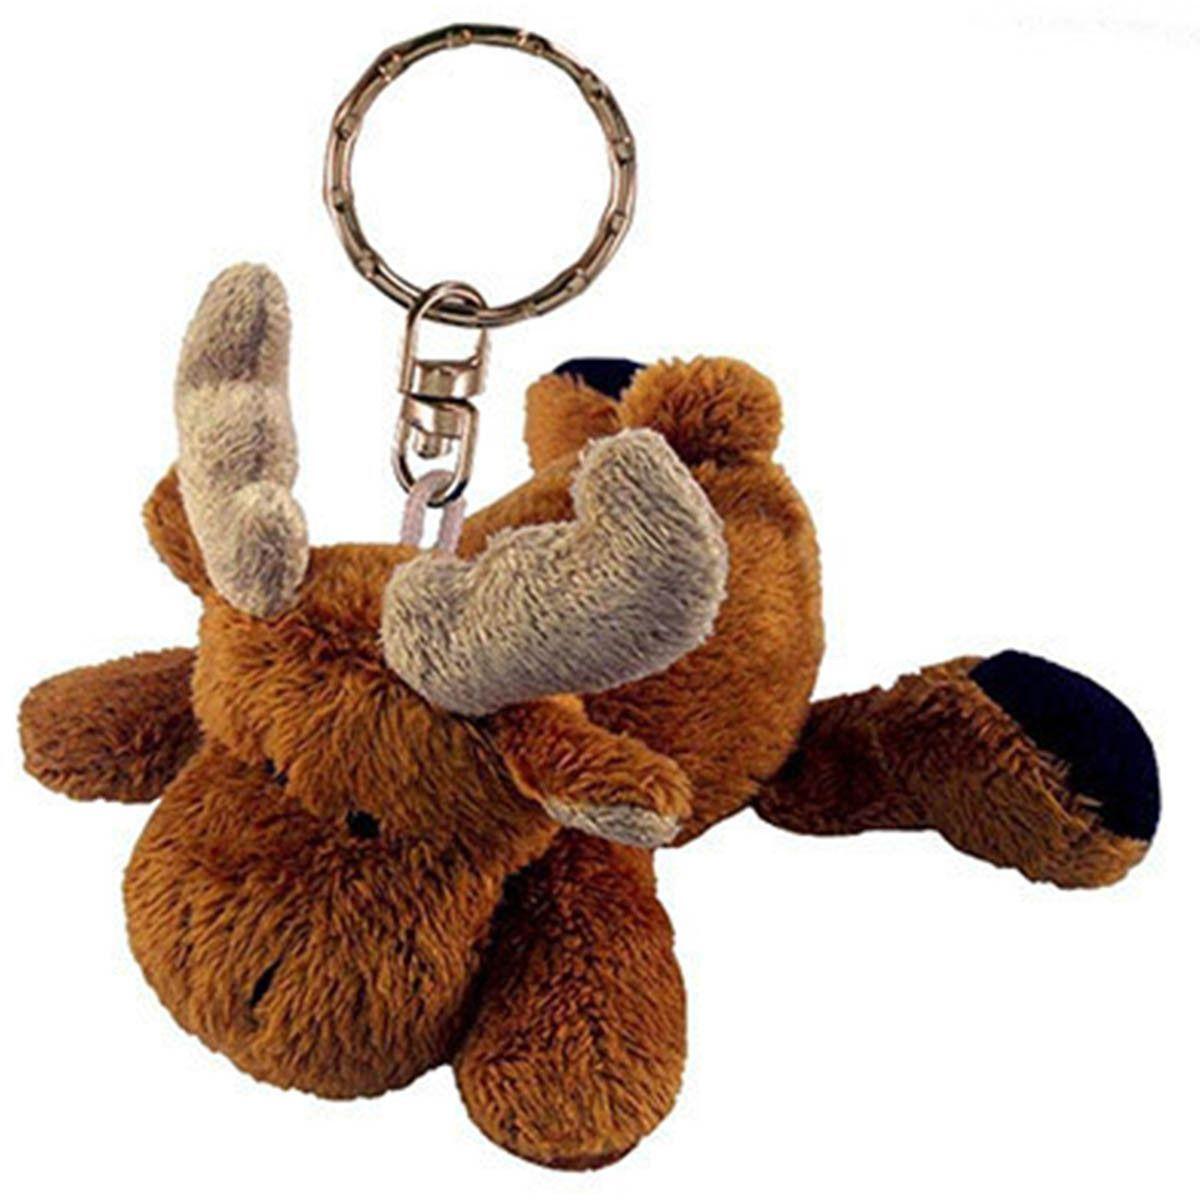 Moose Plush Keychain Plush stuffed animals, Keychain